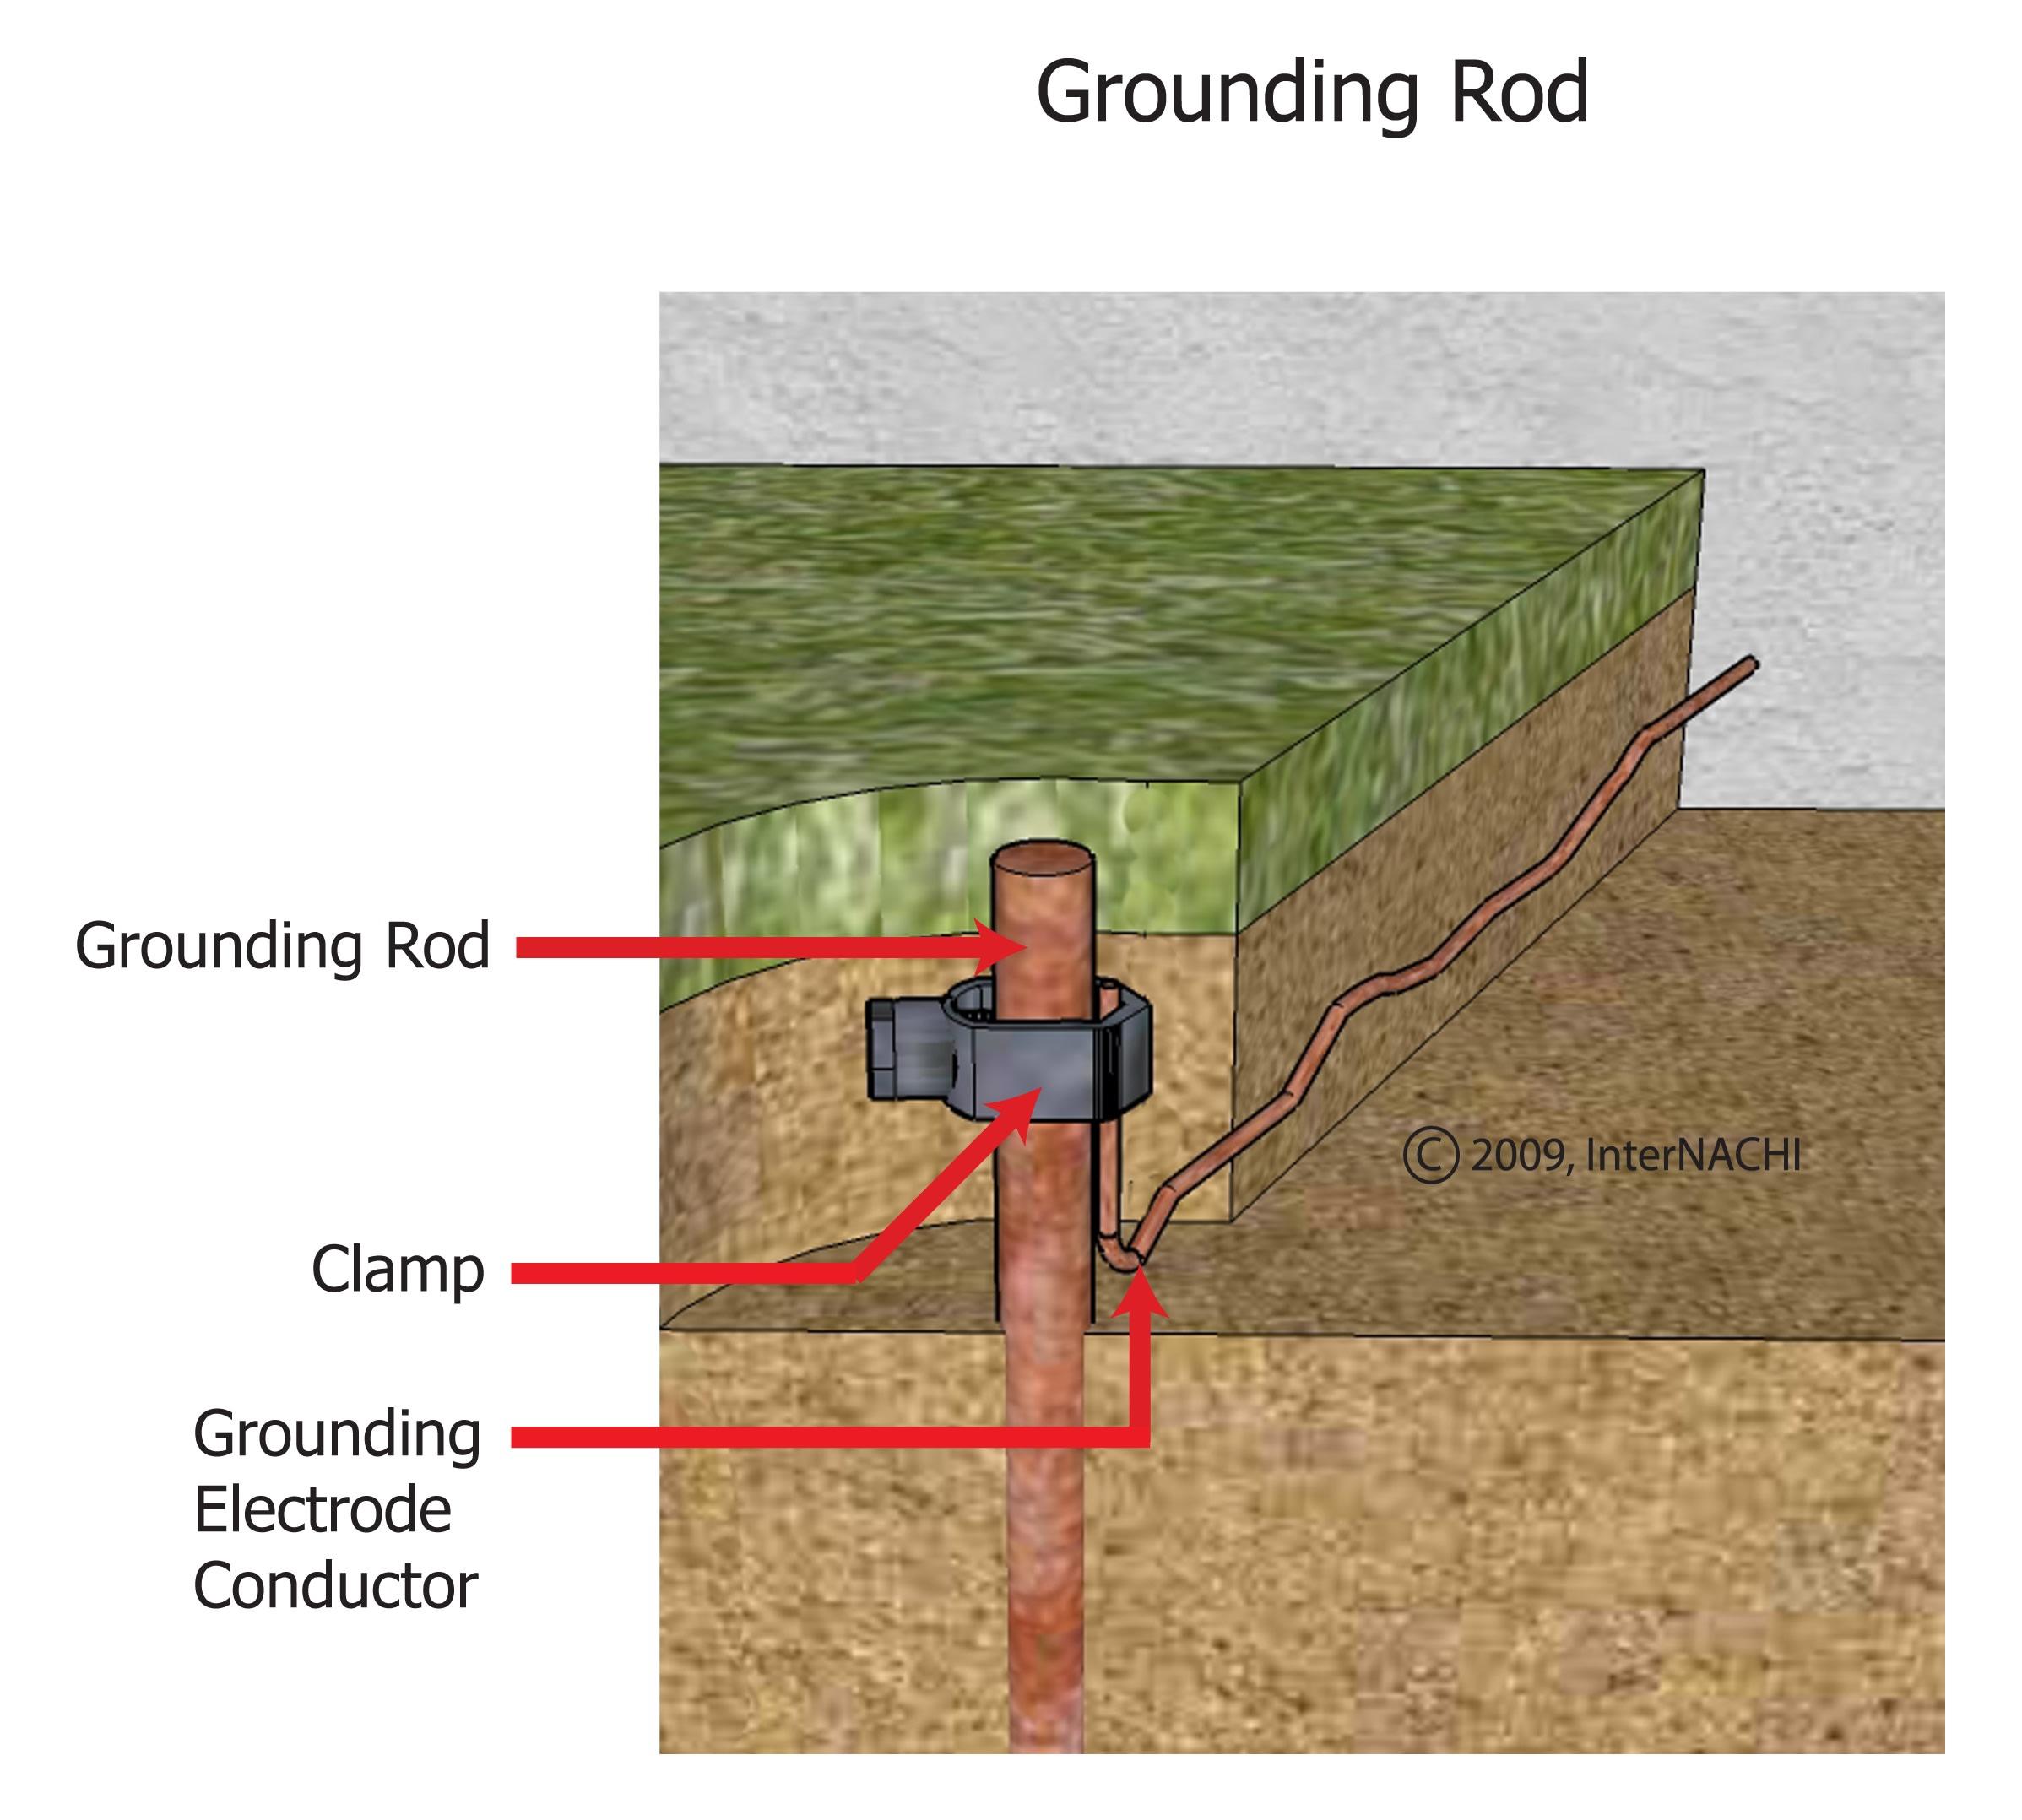 Grounding rod.